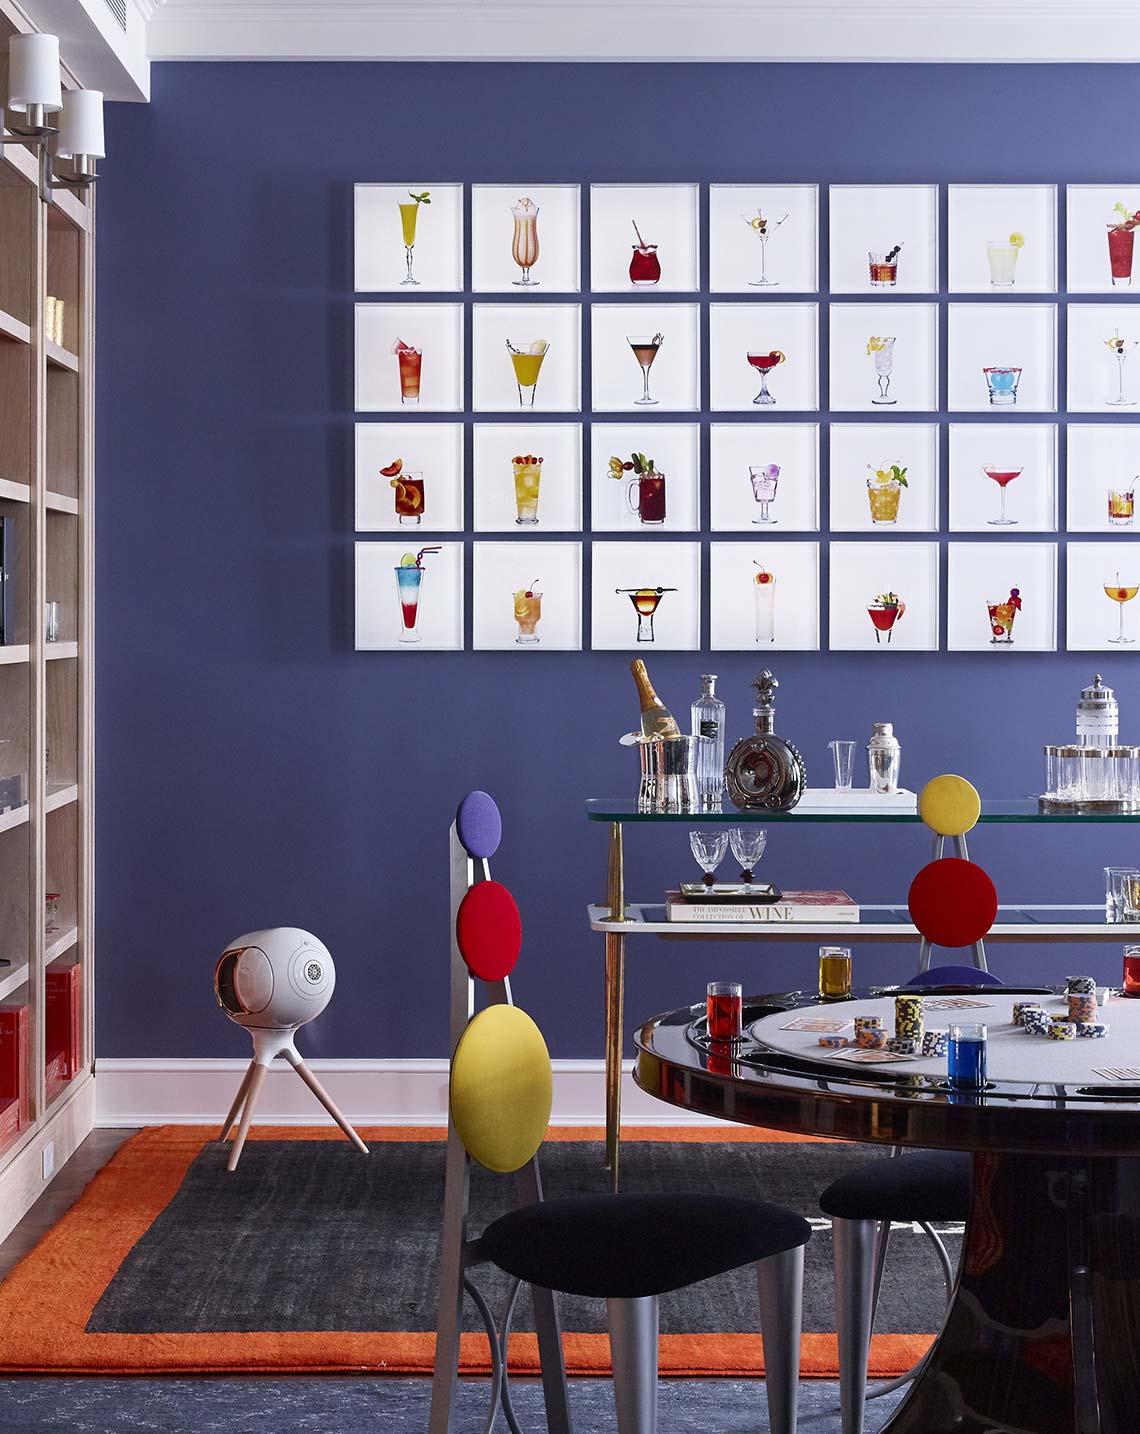 Mark-Addison-Collectors-Game-Room